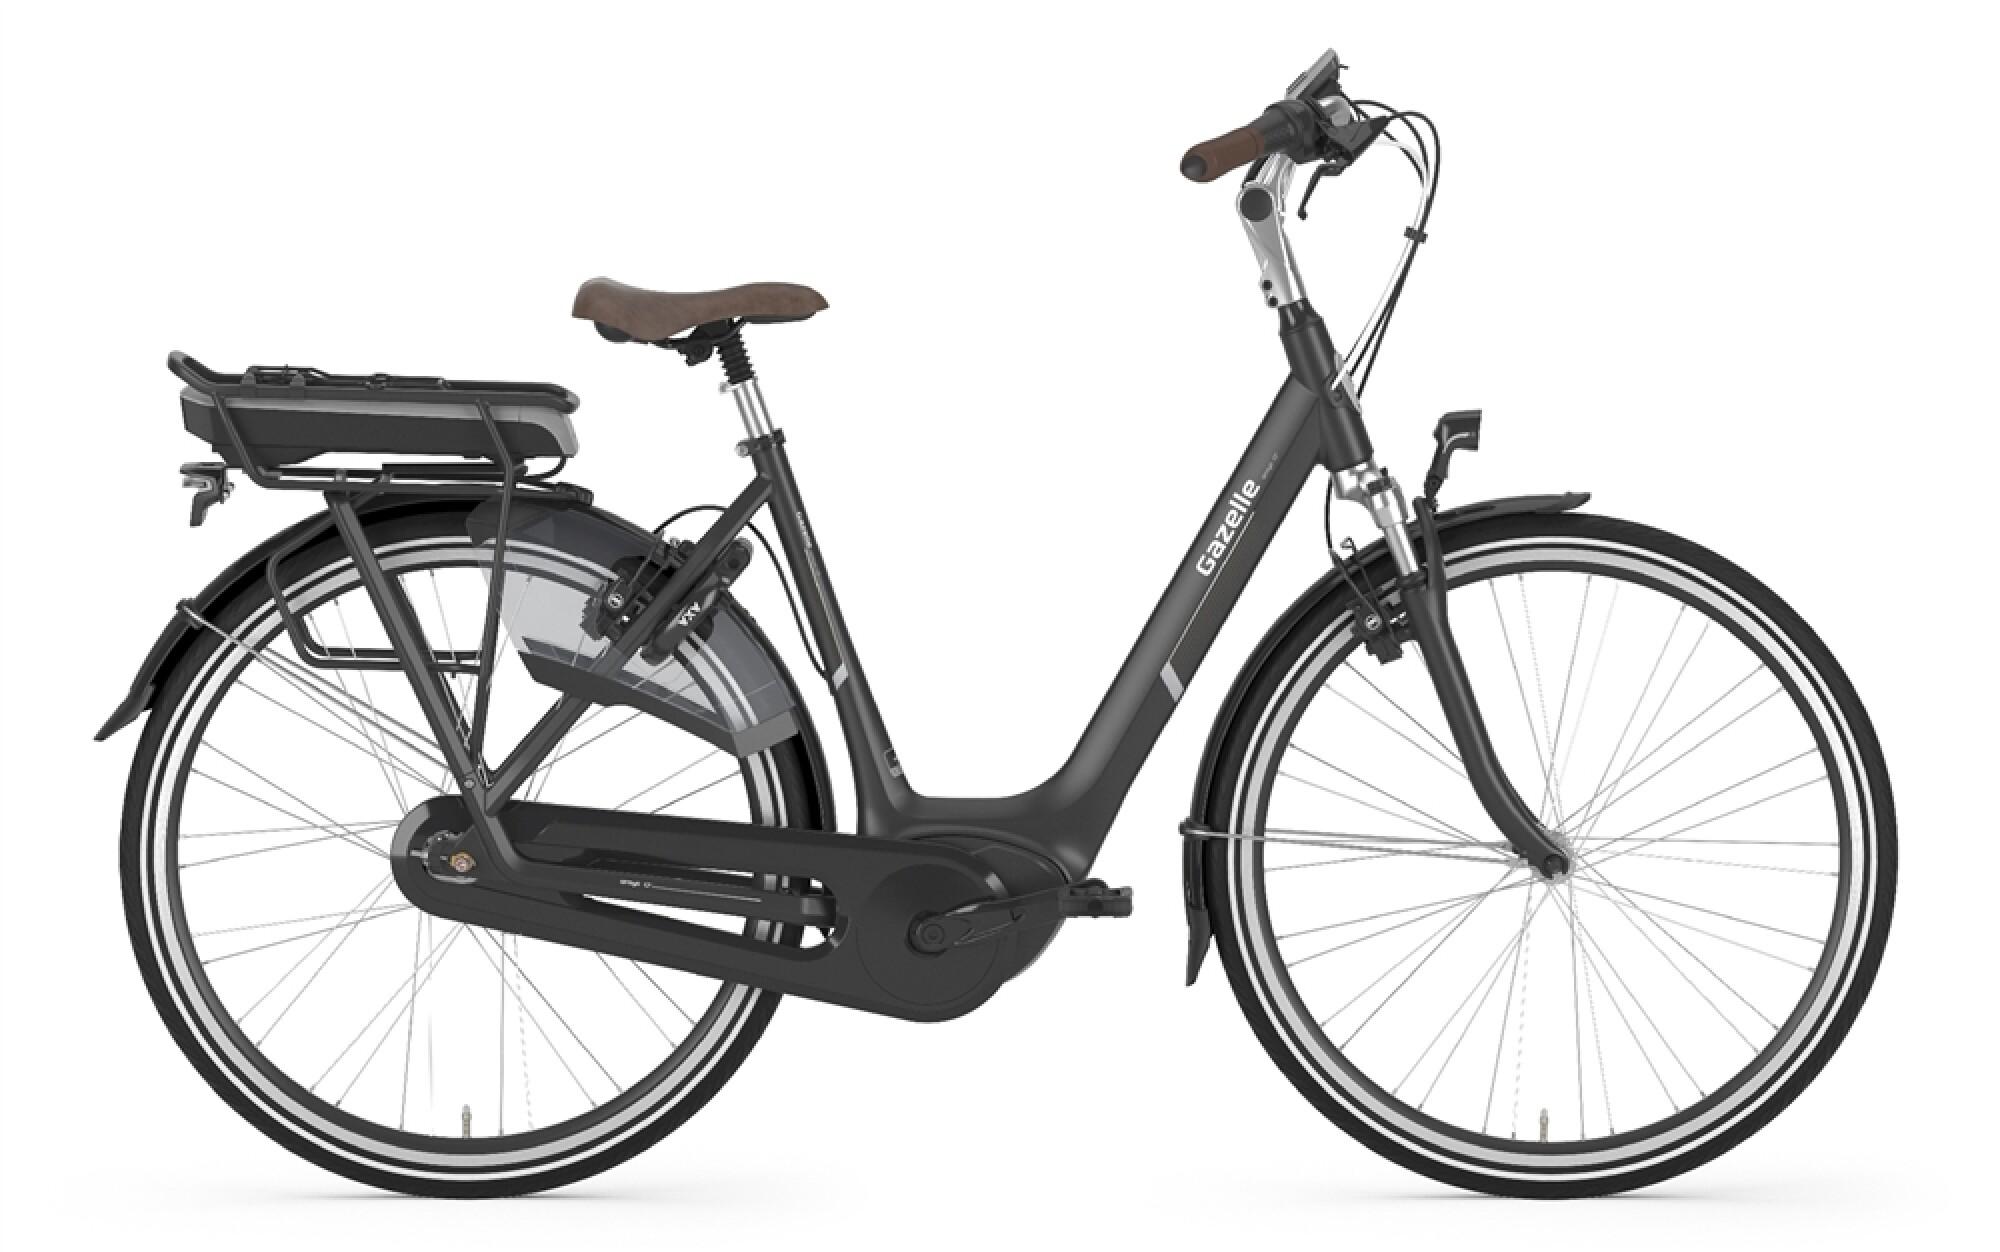 e bike gazelle arroyo c7 hmb 2018 bei alle. Black Bedroom Furniture Sets. Home Design Ideas